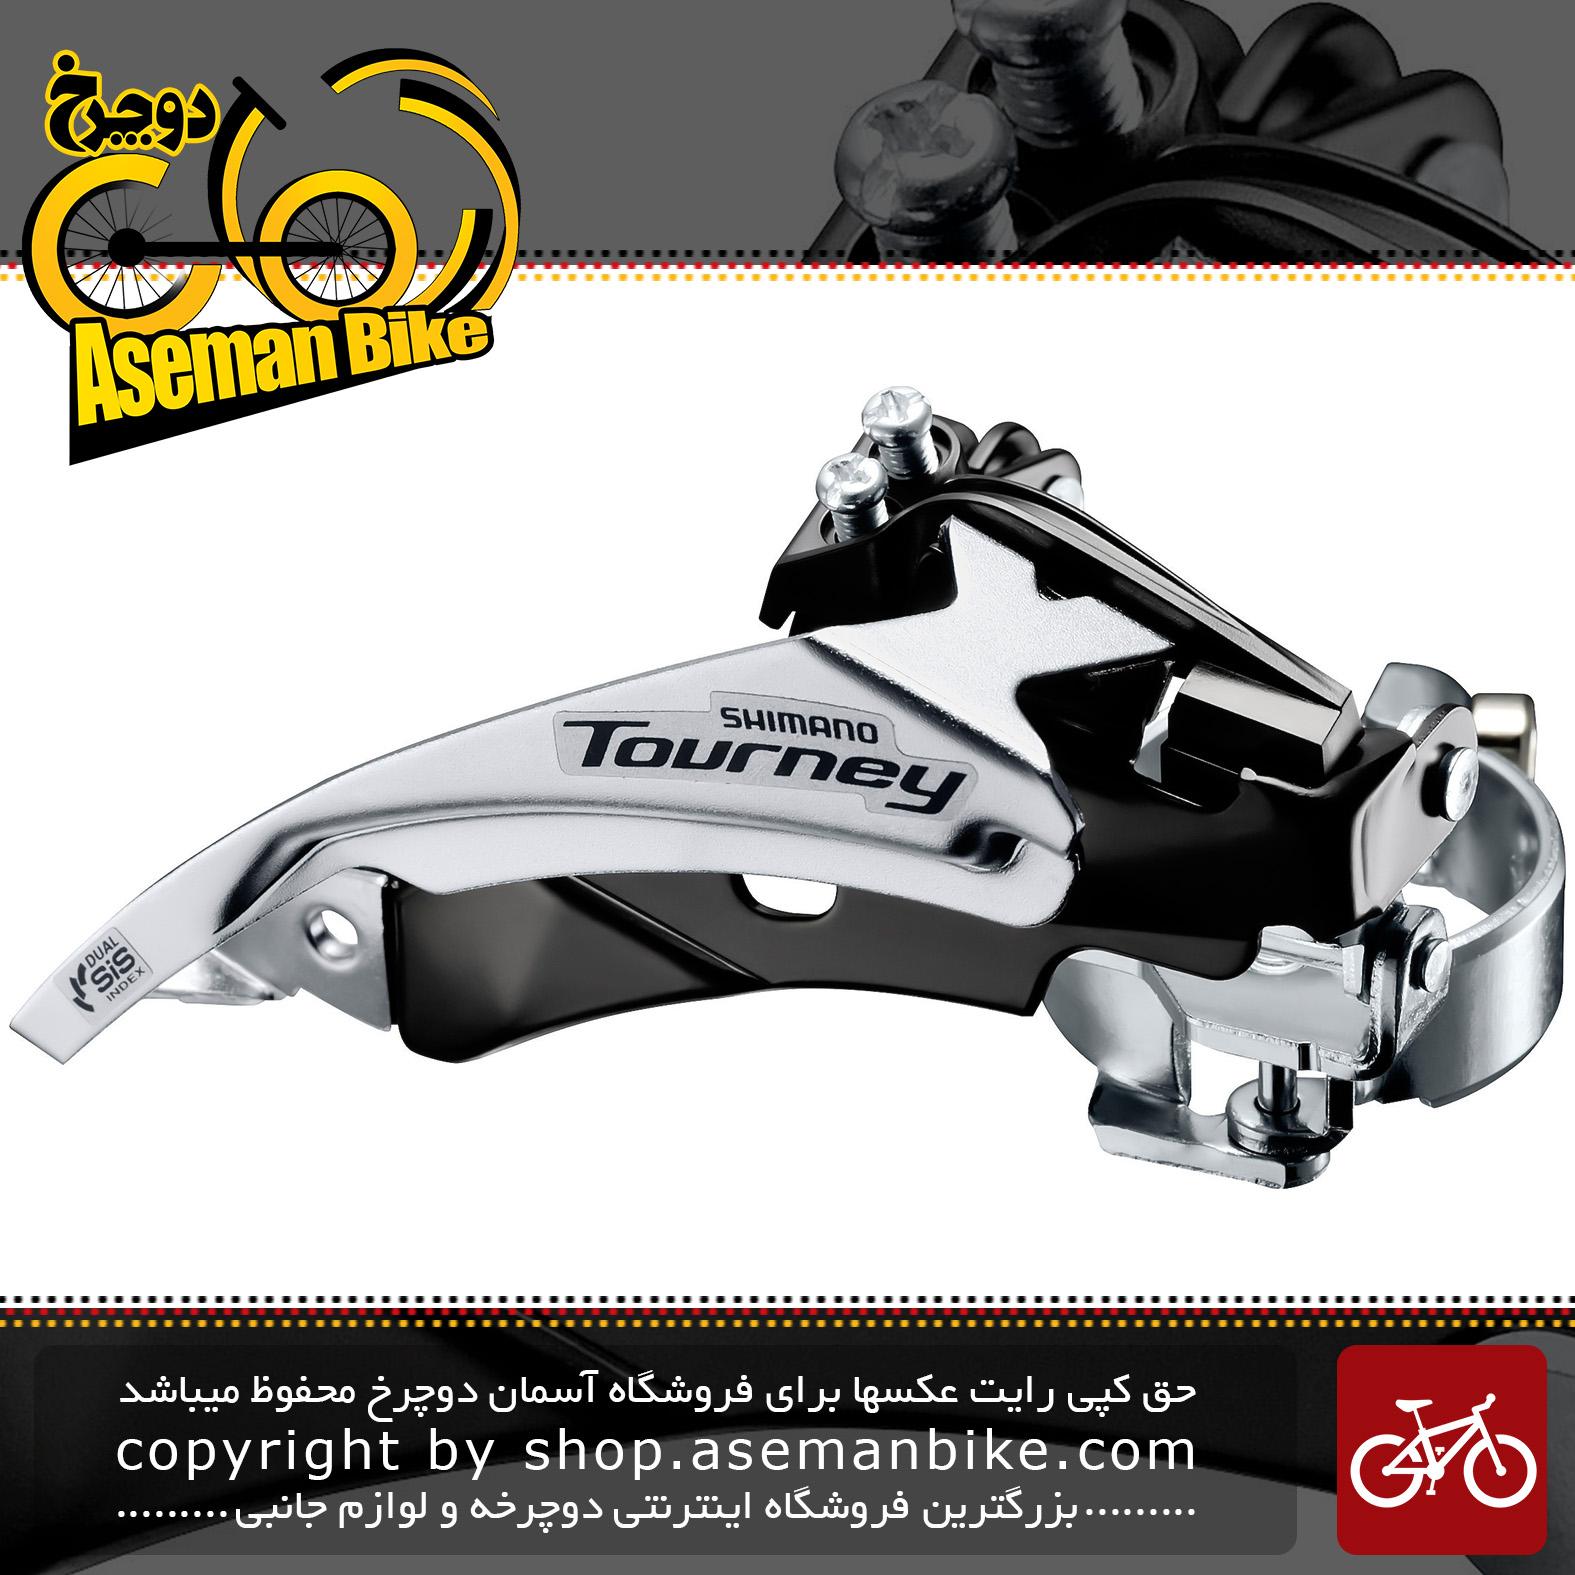 طبق عوض کن دوچرخه شیمانو تورنی Shimano TOURNEY FD-TY510-TS3 TOP SWING Front Derailleur (3x7-6-speed)